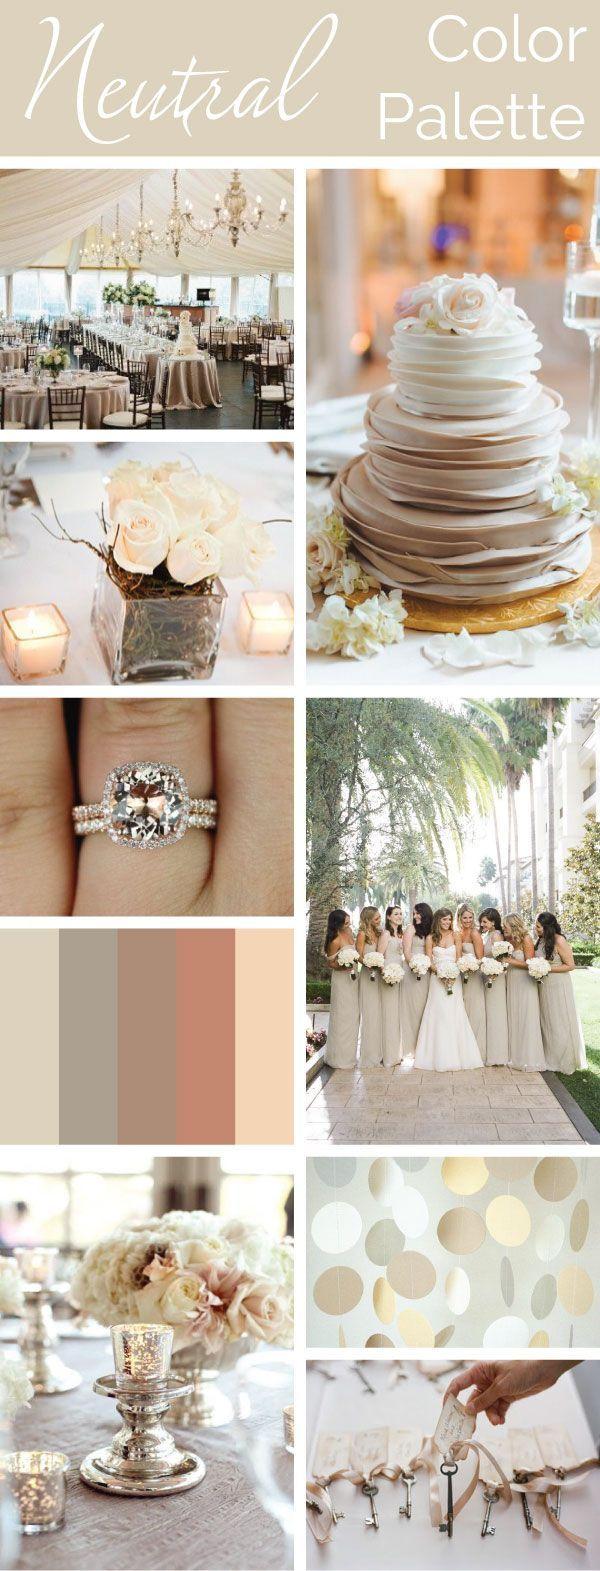 Neutral Color Palette: Simple, Elegant, Versatile. #wedding-pinned by wedding decorations specialists http://dazzlemeelegant.com